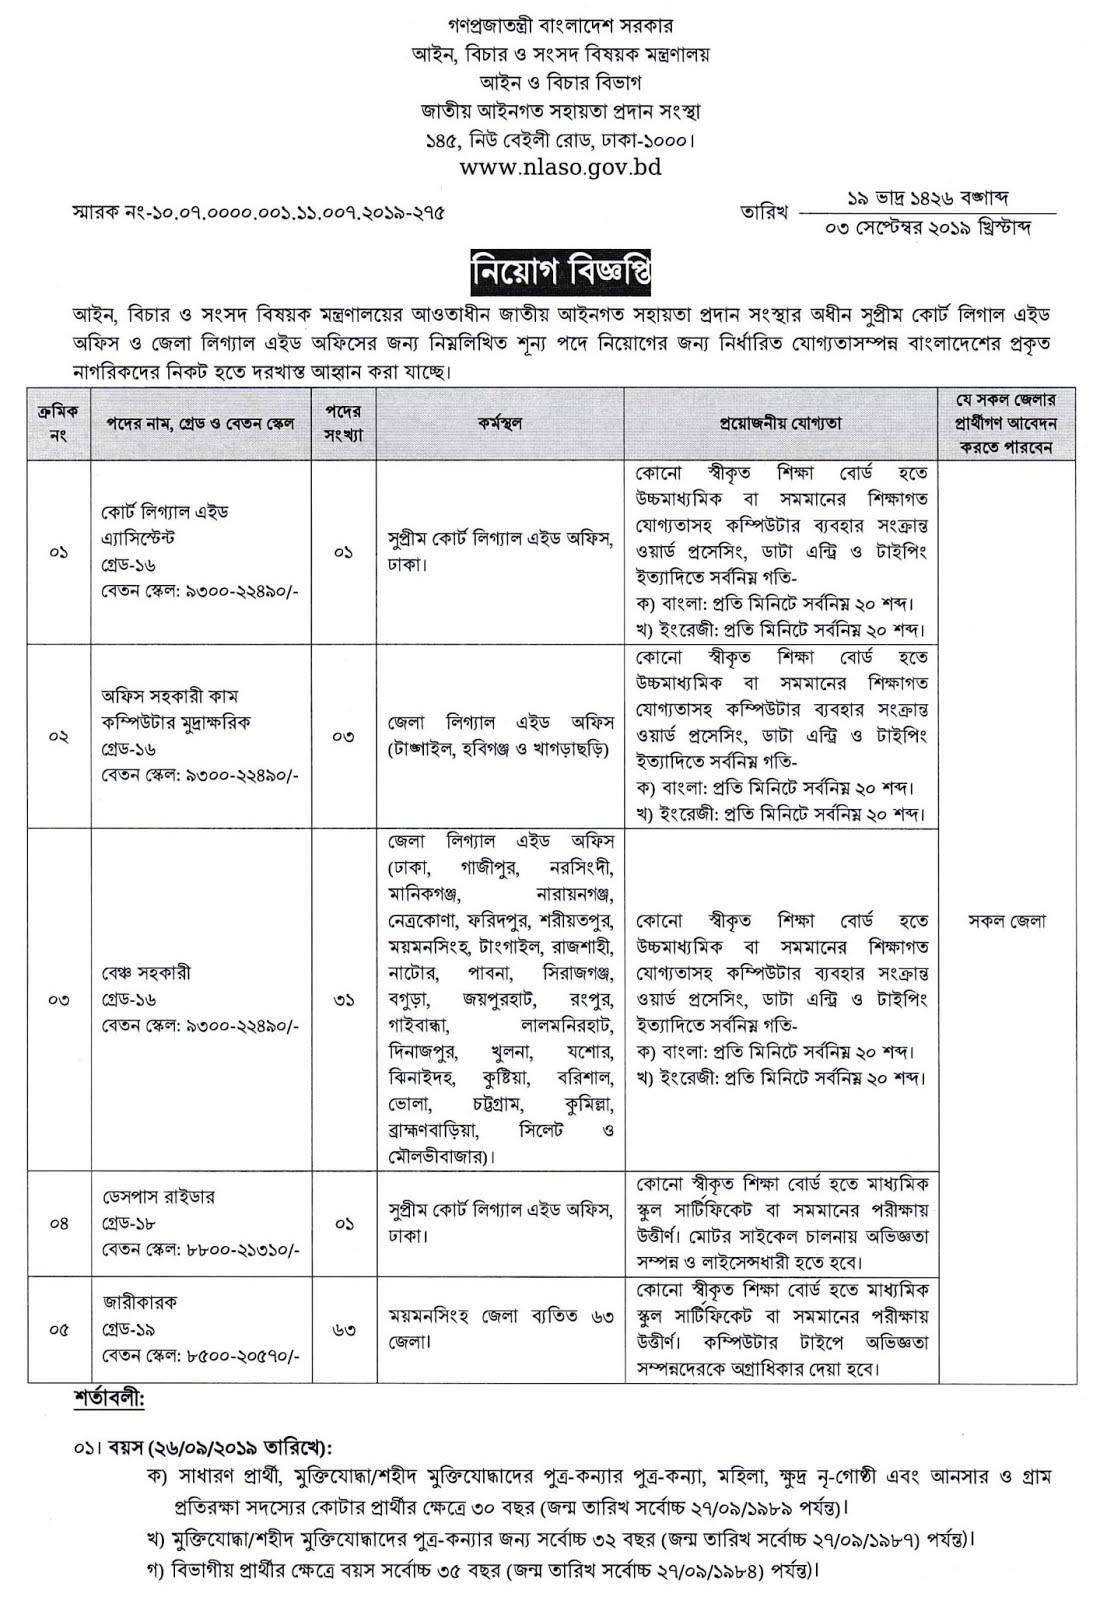 NLASO Job Circular 2019 & Teletalk Apply -nlaso teletalk com bd